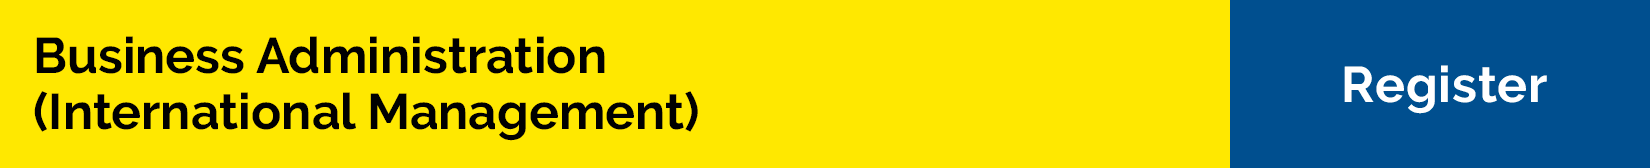 Business Administration (International Management)